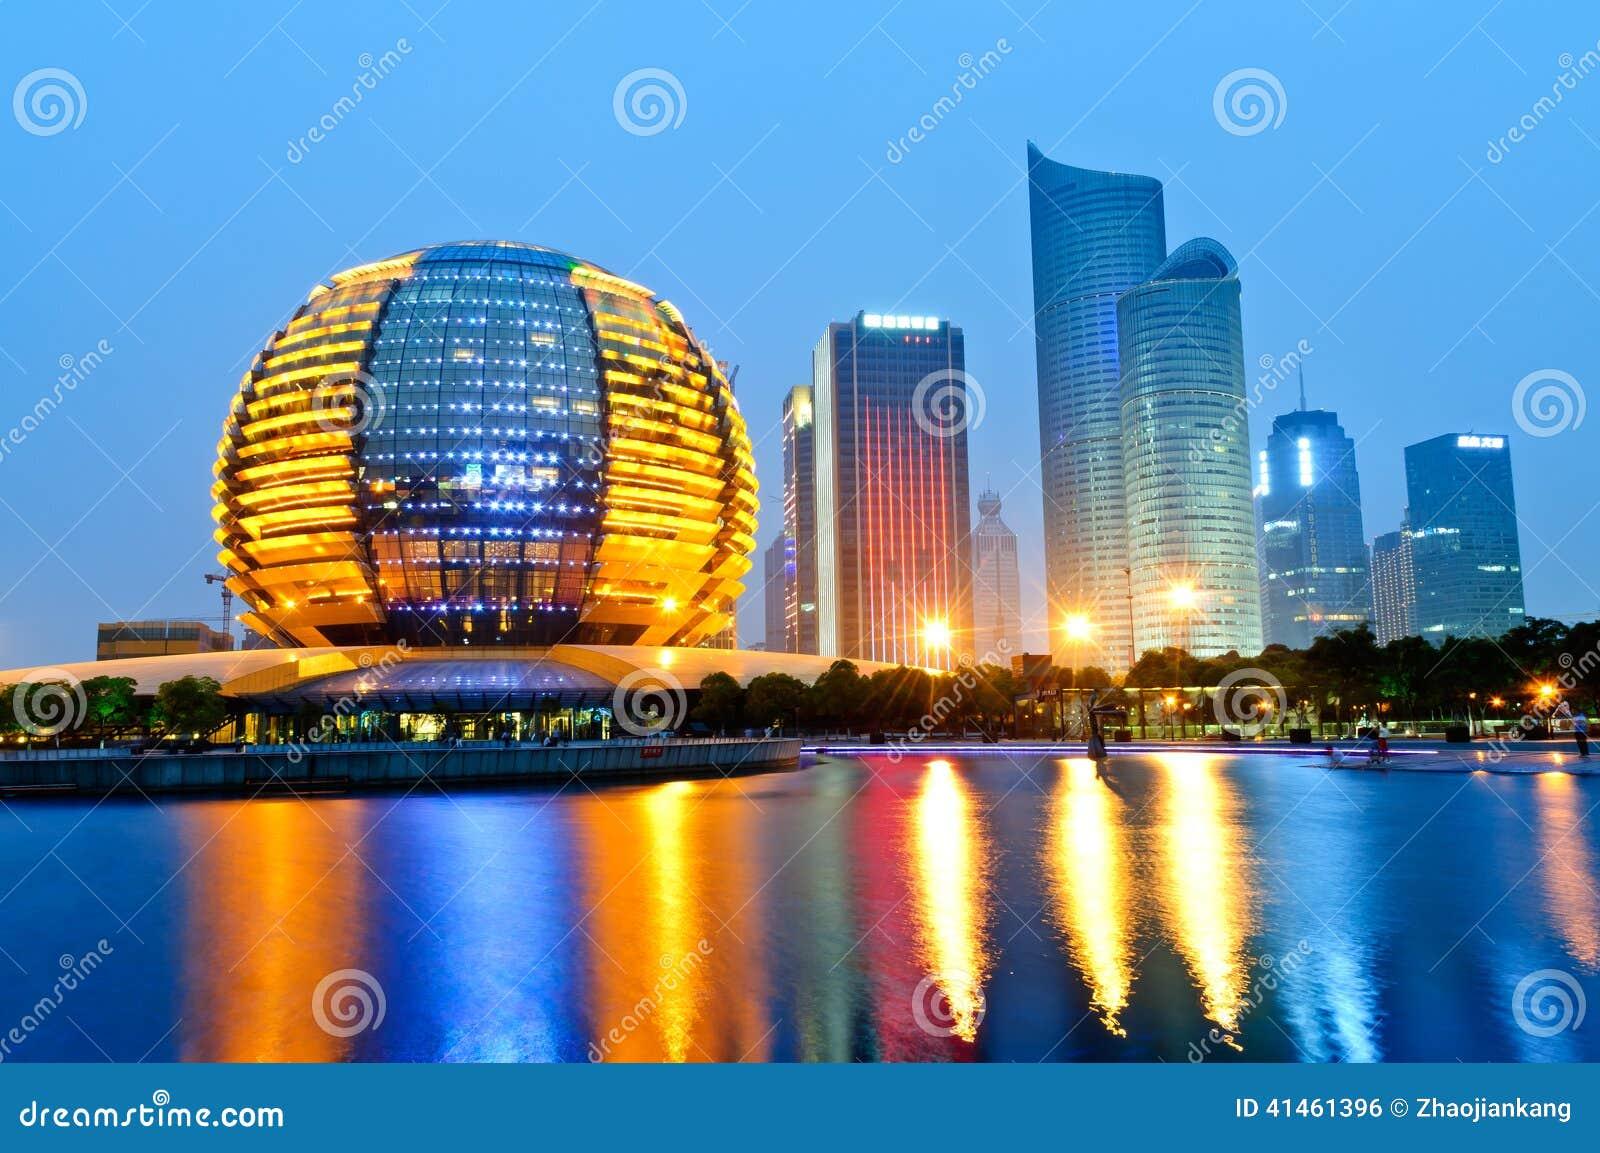 Hangzhou international conference center at night - Hangzhou congress center ...